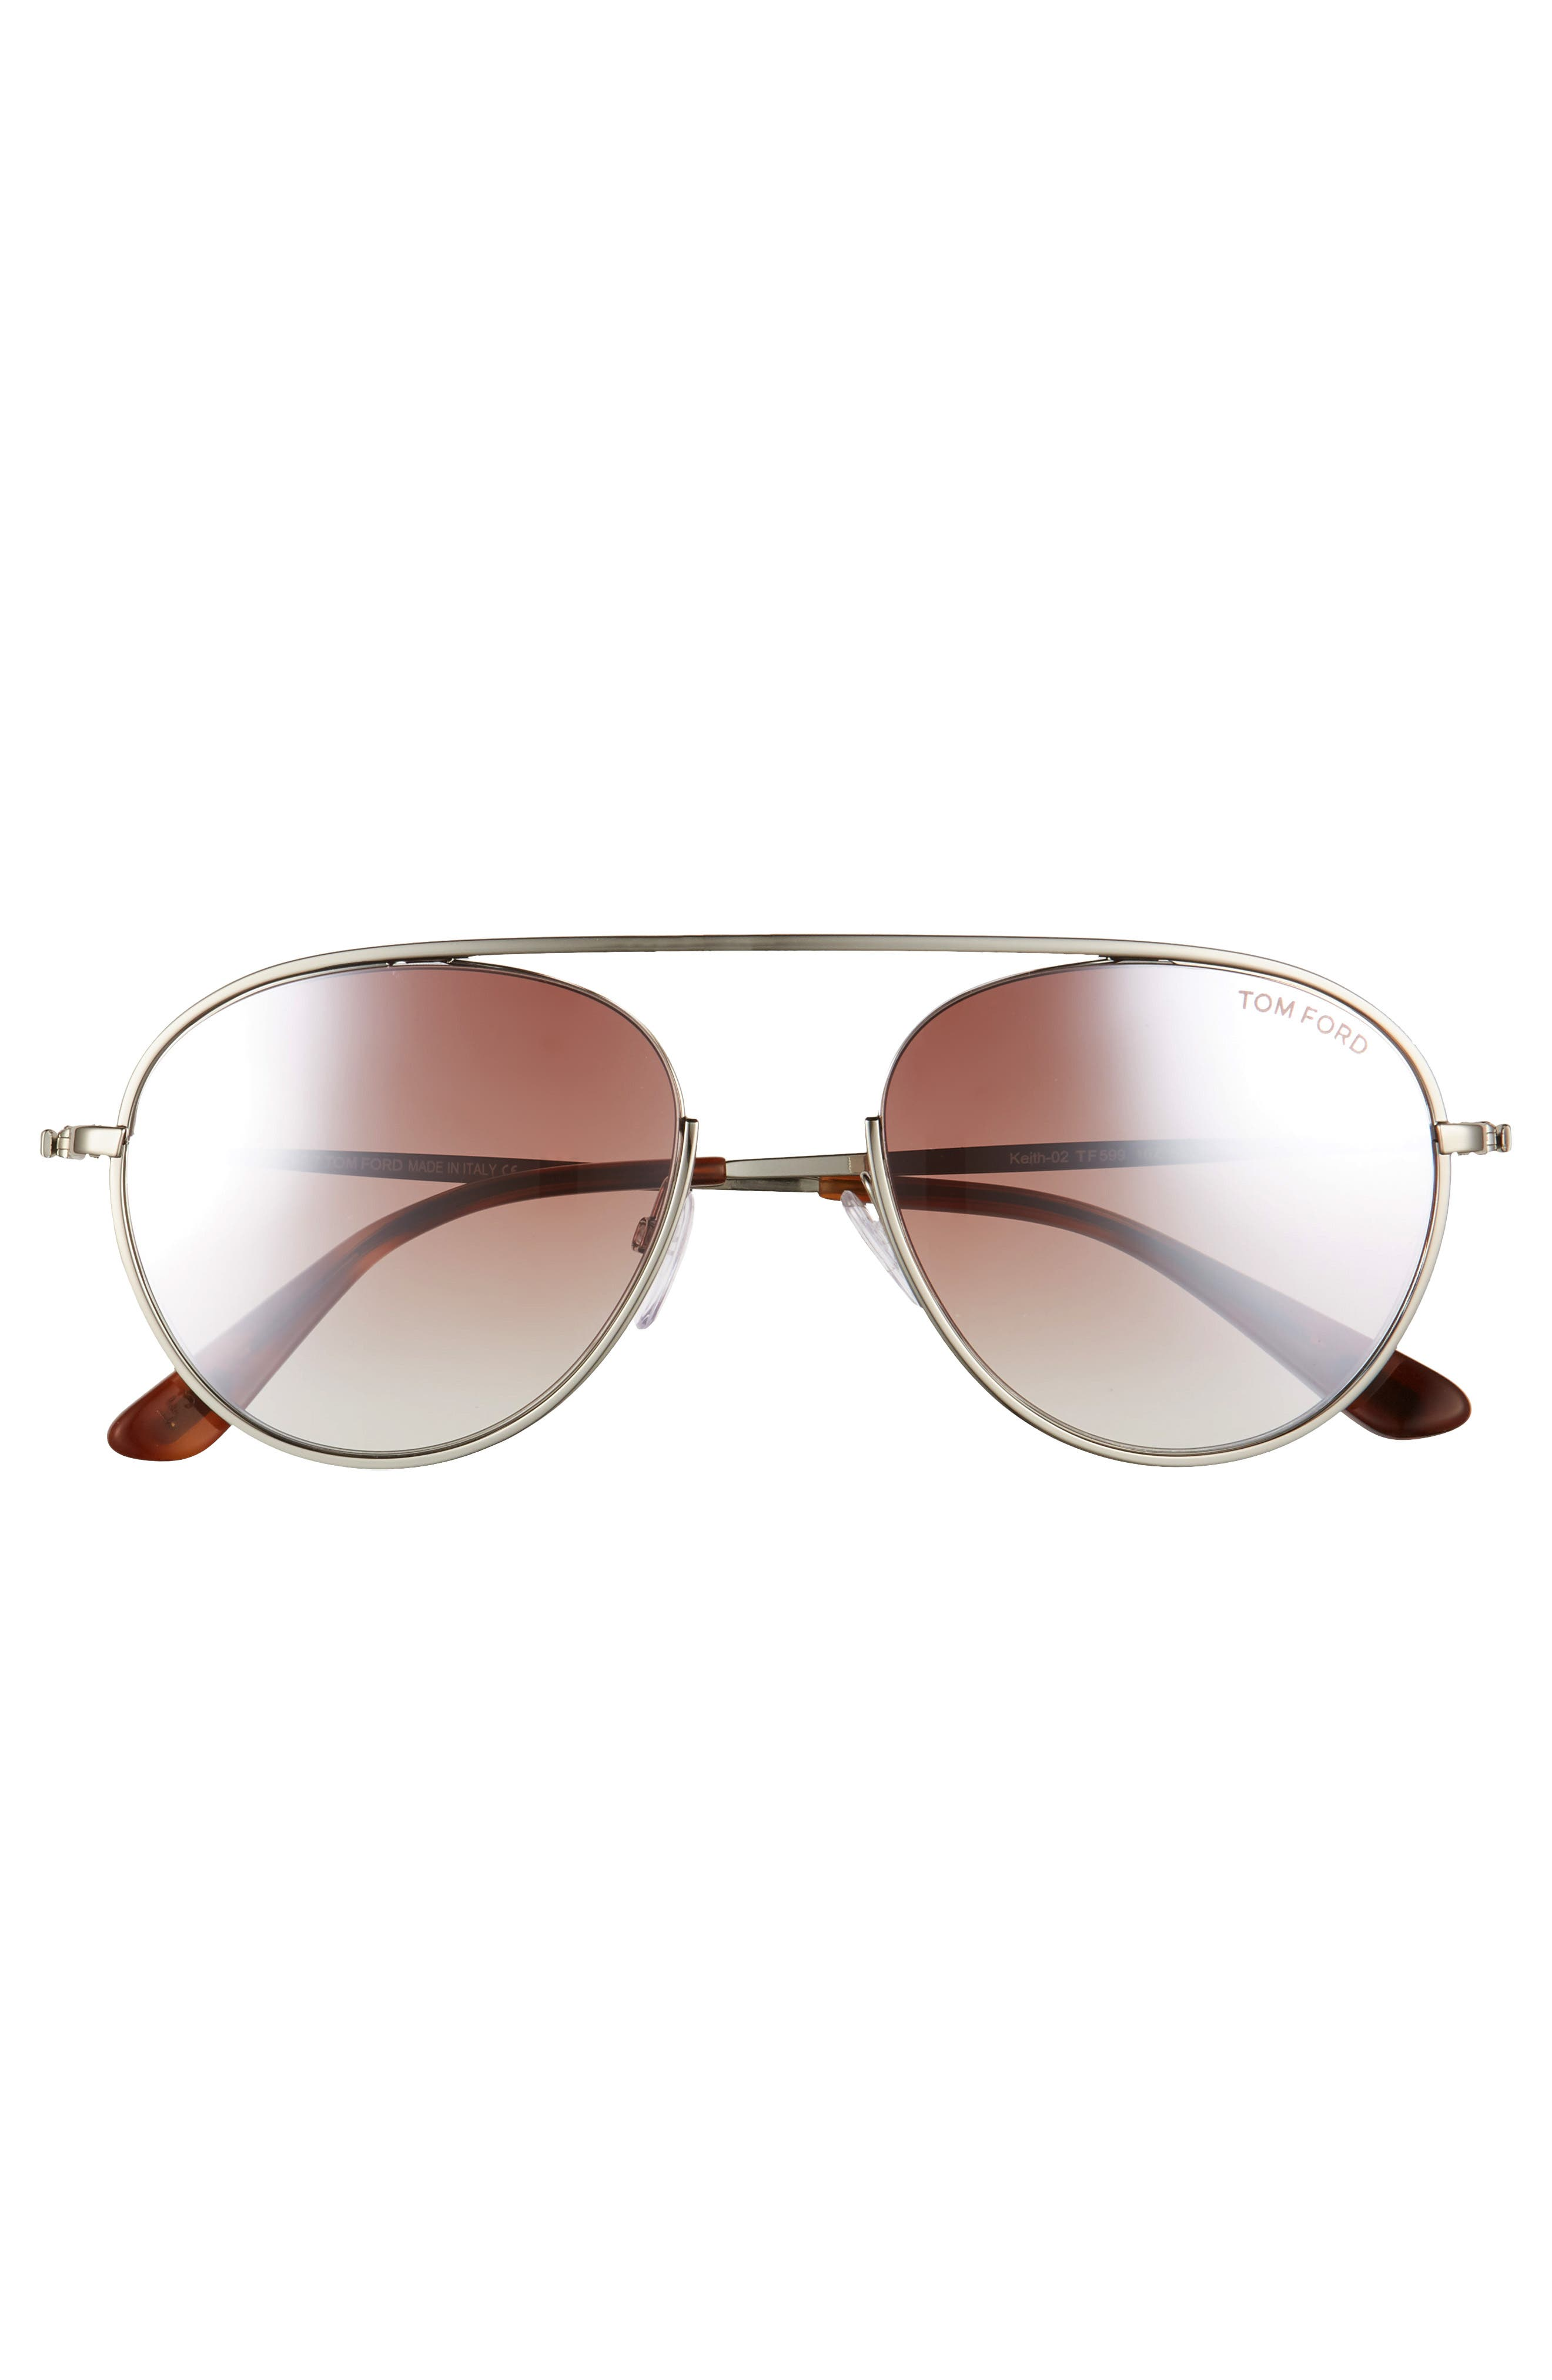 Keith 55mm Metal Aviator Sunglasses,                             Alternate thumbnail 3, color,                             040